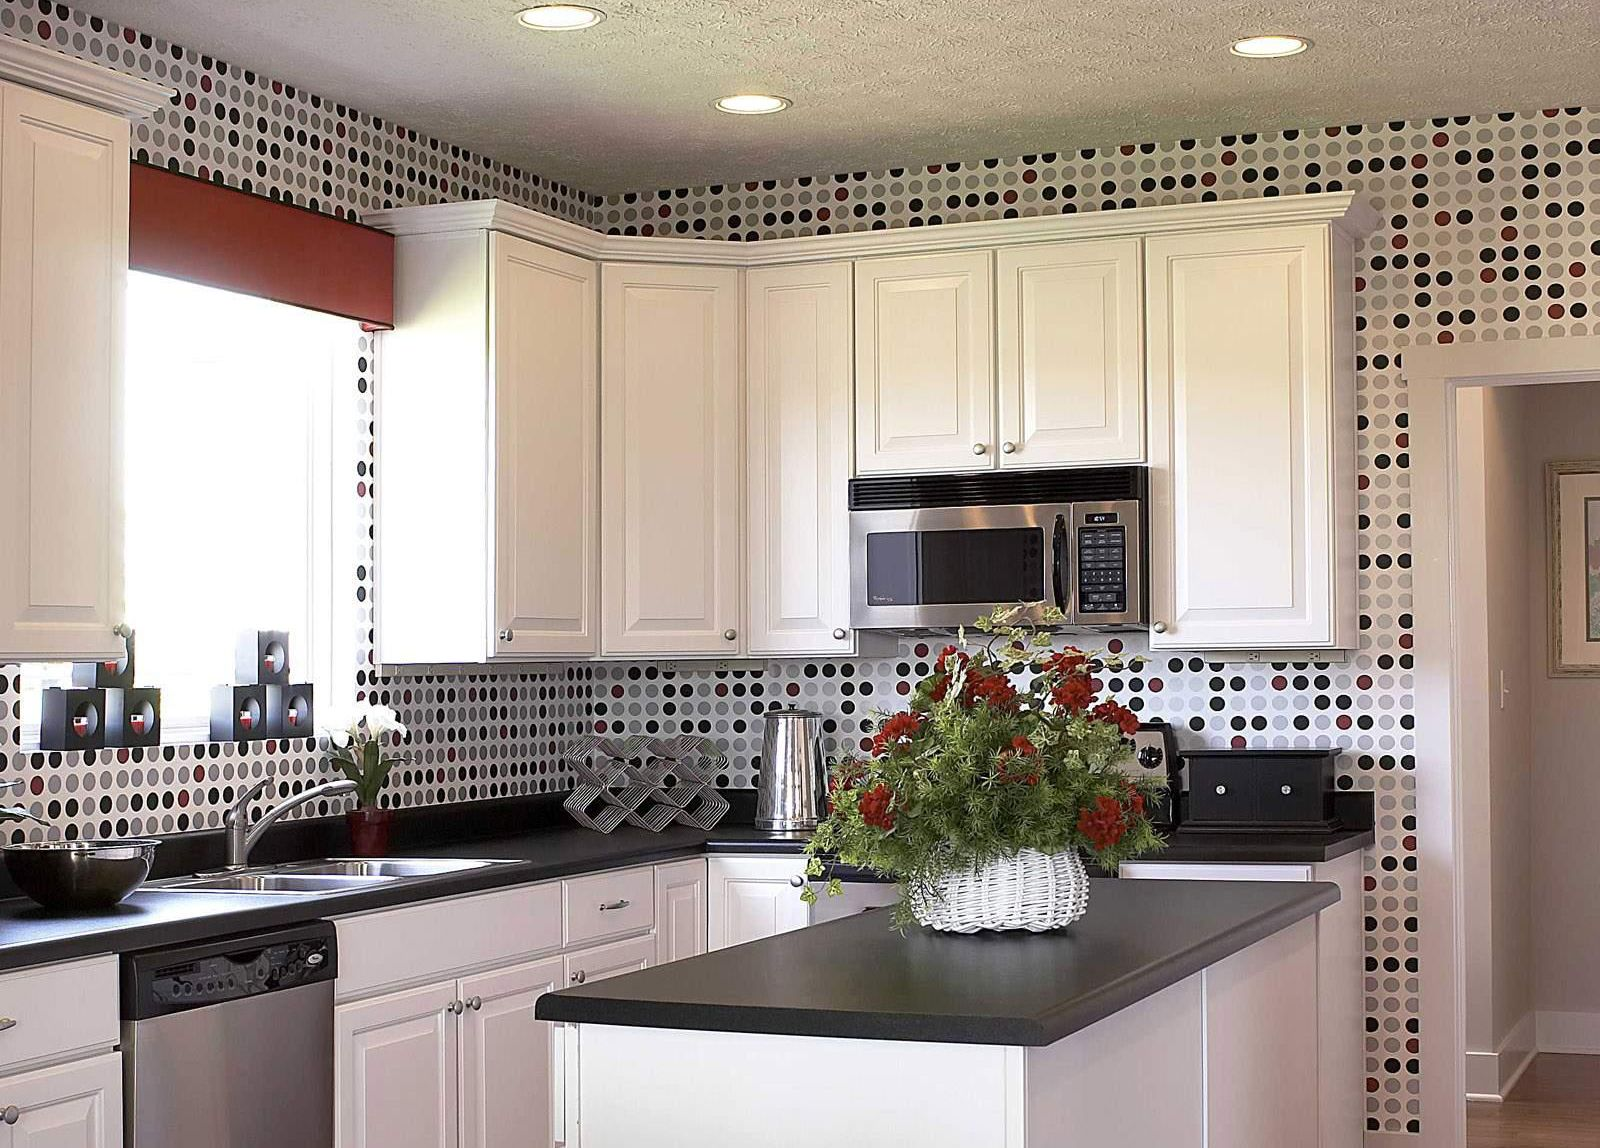 Kitchen Design With Ceramics Motif Black and White KITCHEN